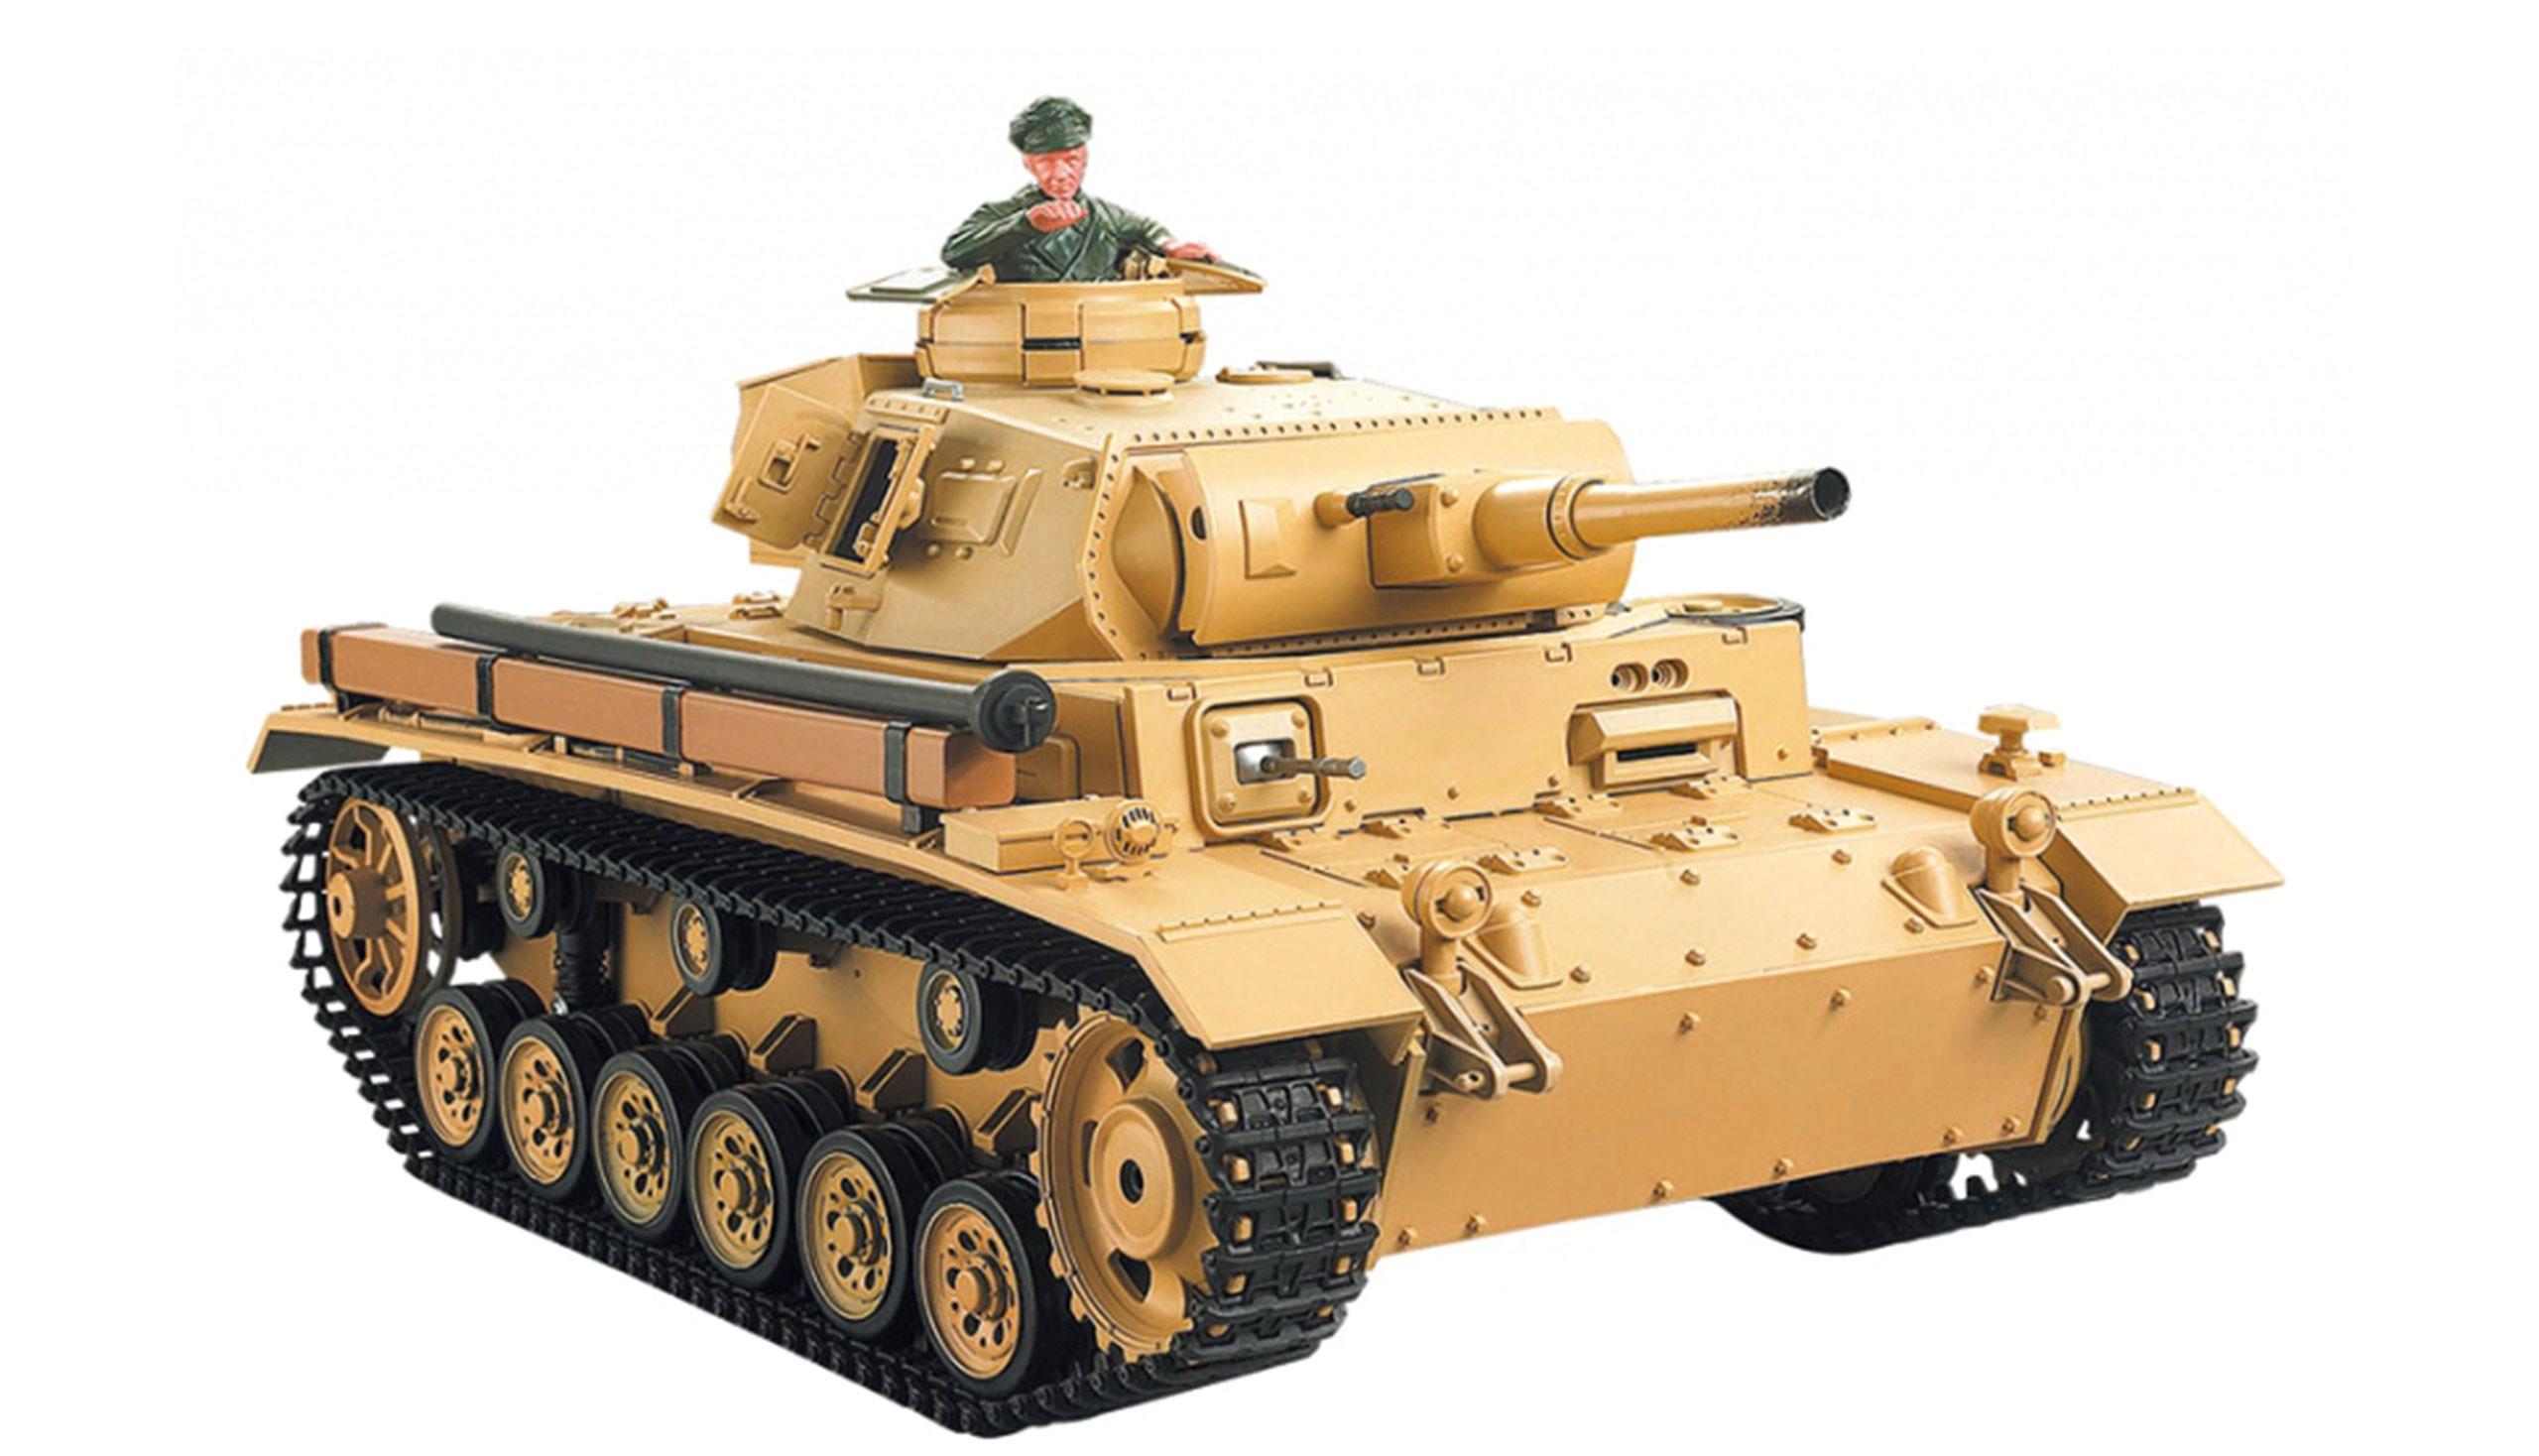 Amewi 23064 - Funkgesteuerter (RC) Panzer - Elektromotor - 1:16 - Betriebsbereit (RTR) - Biege - 2,4 GHz